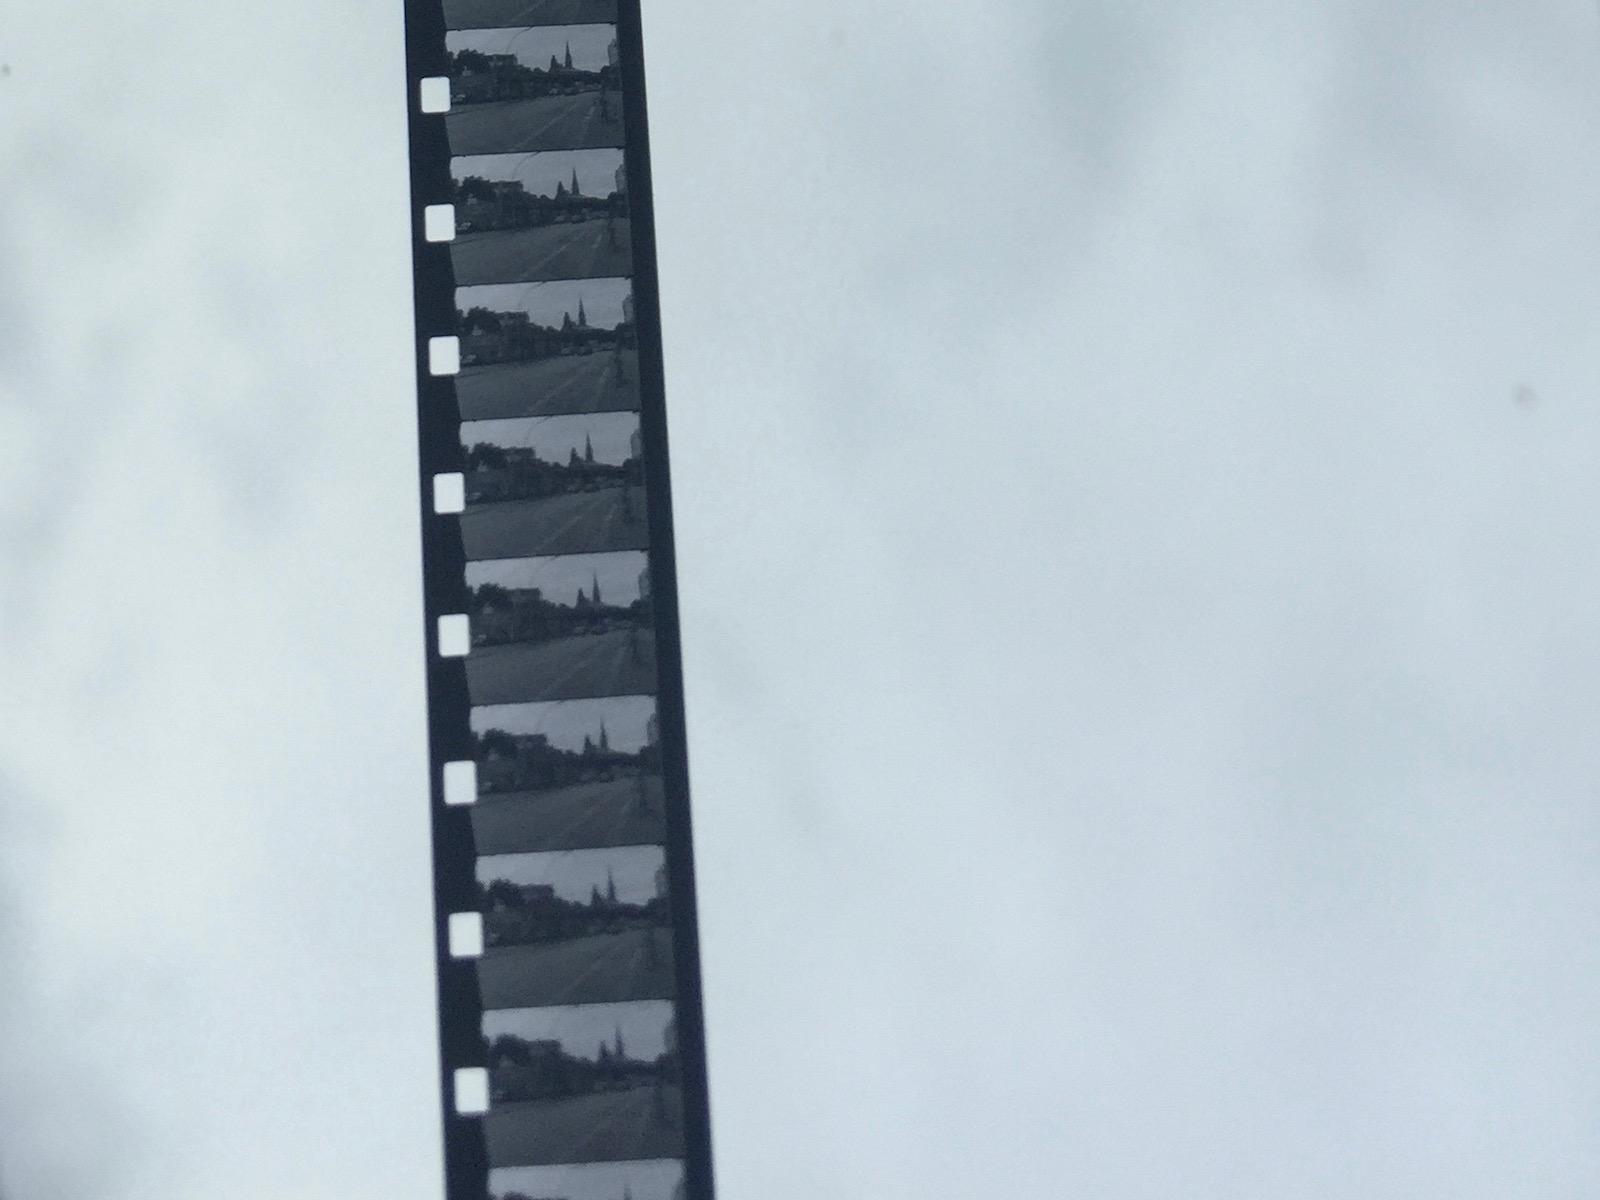 My Super8 8mm Experiment - 8mm film resolution - mprecke